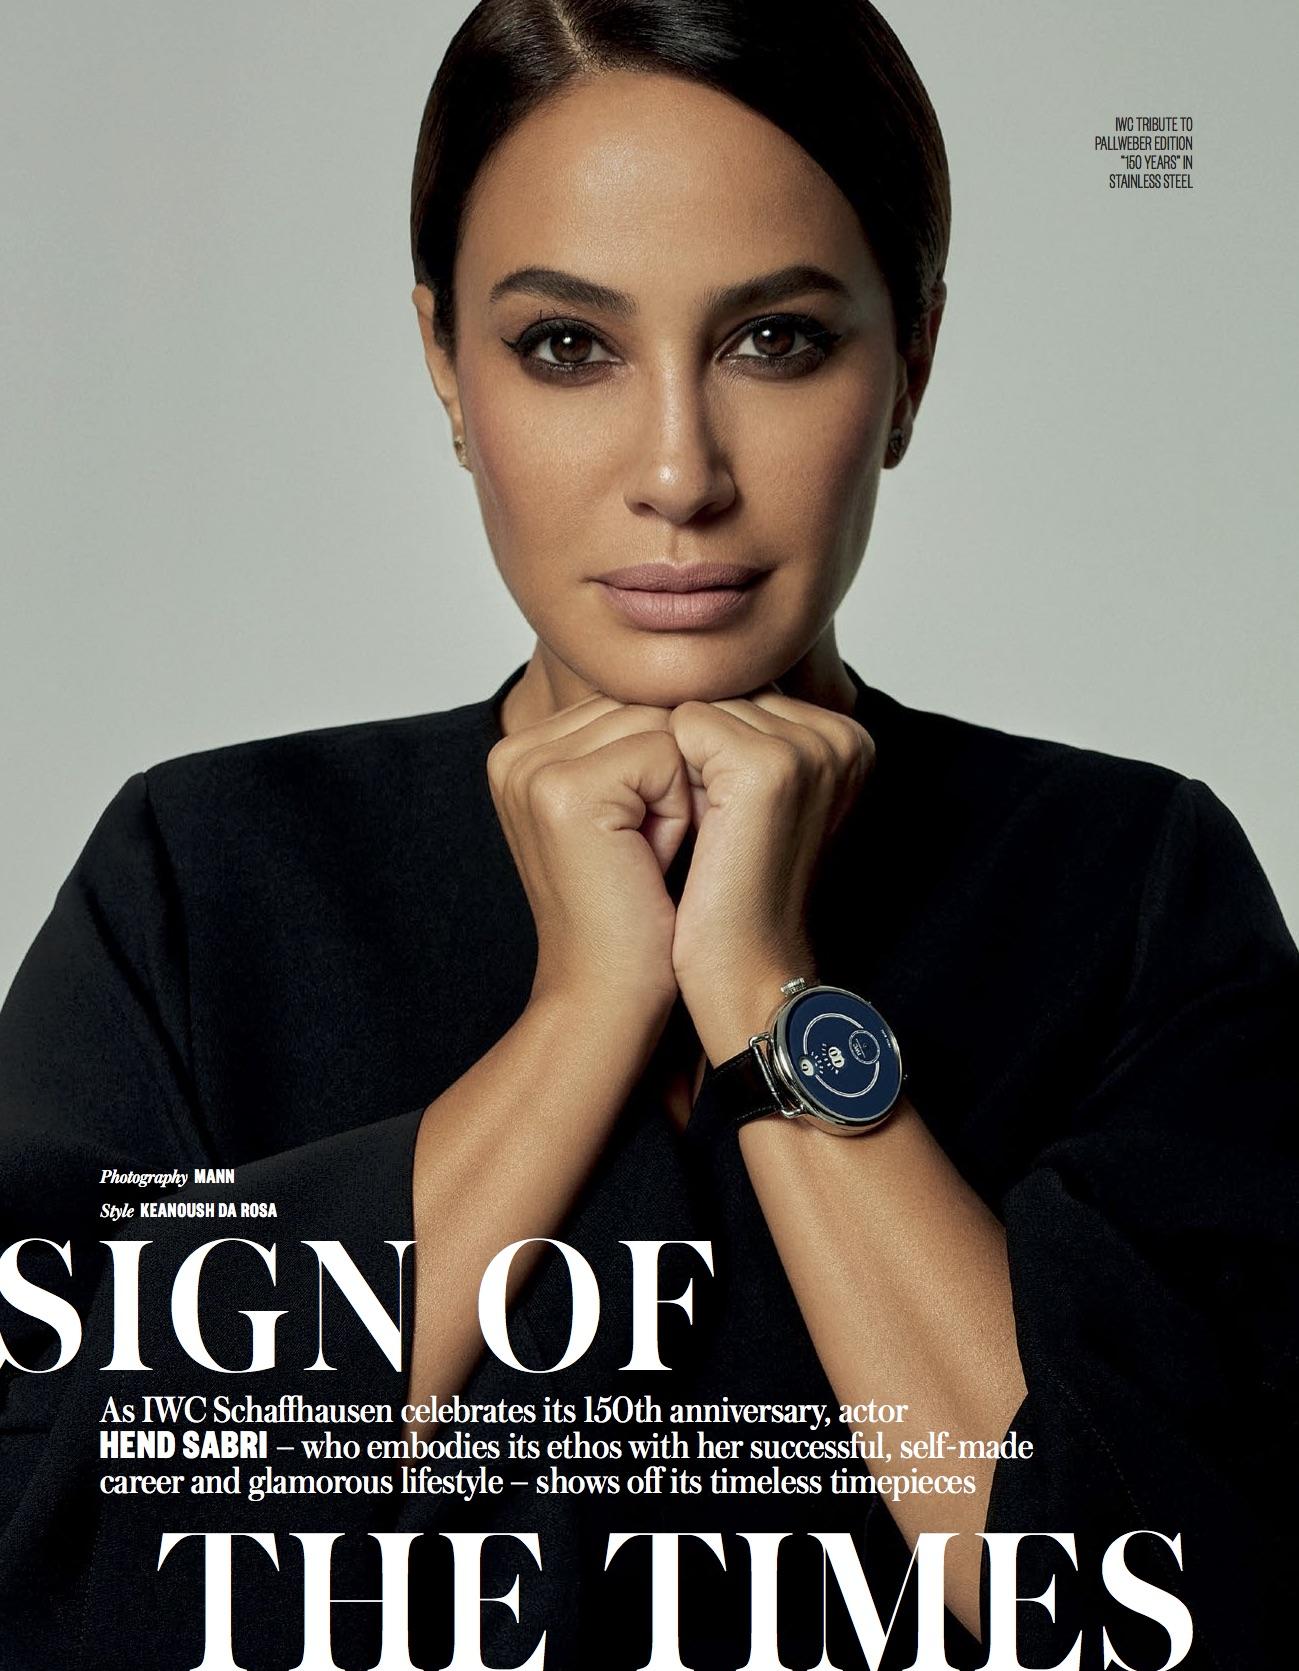 Vogue Arabia September FinalBinder_Magzter (dragged) 1.jpg